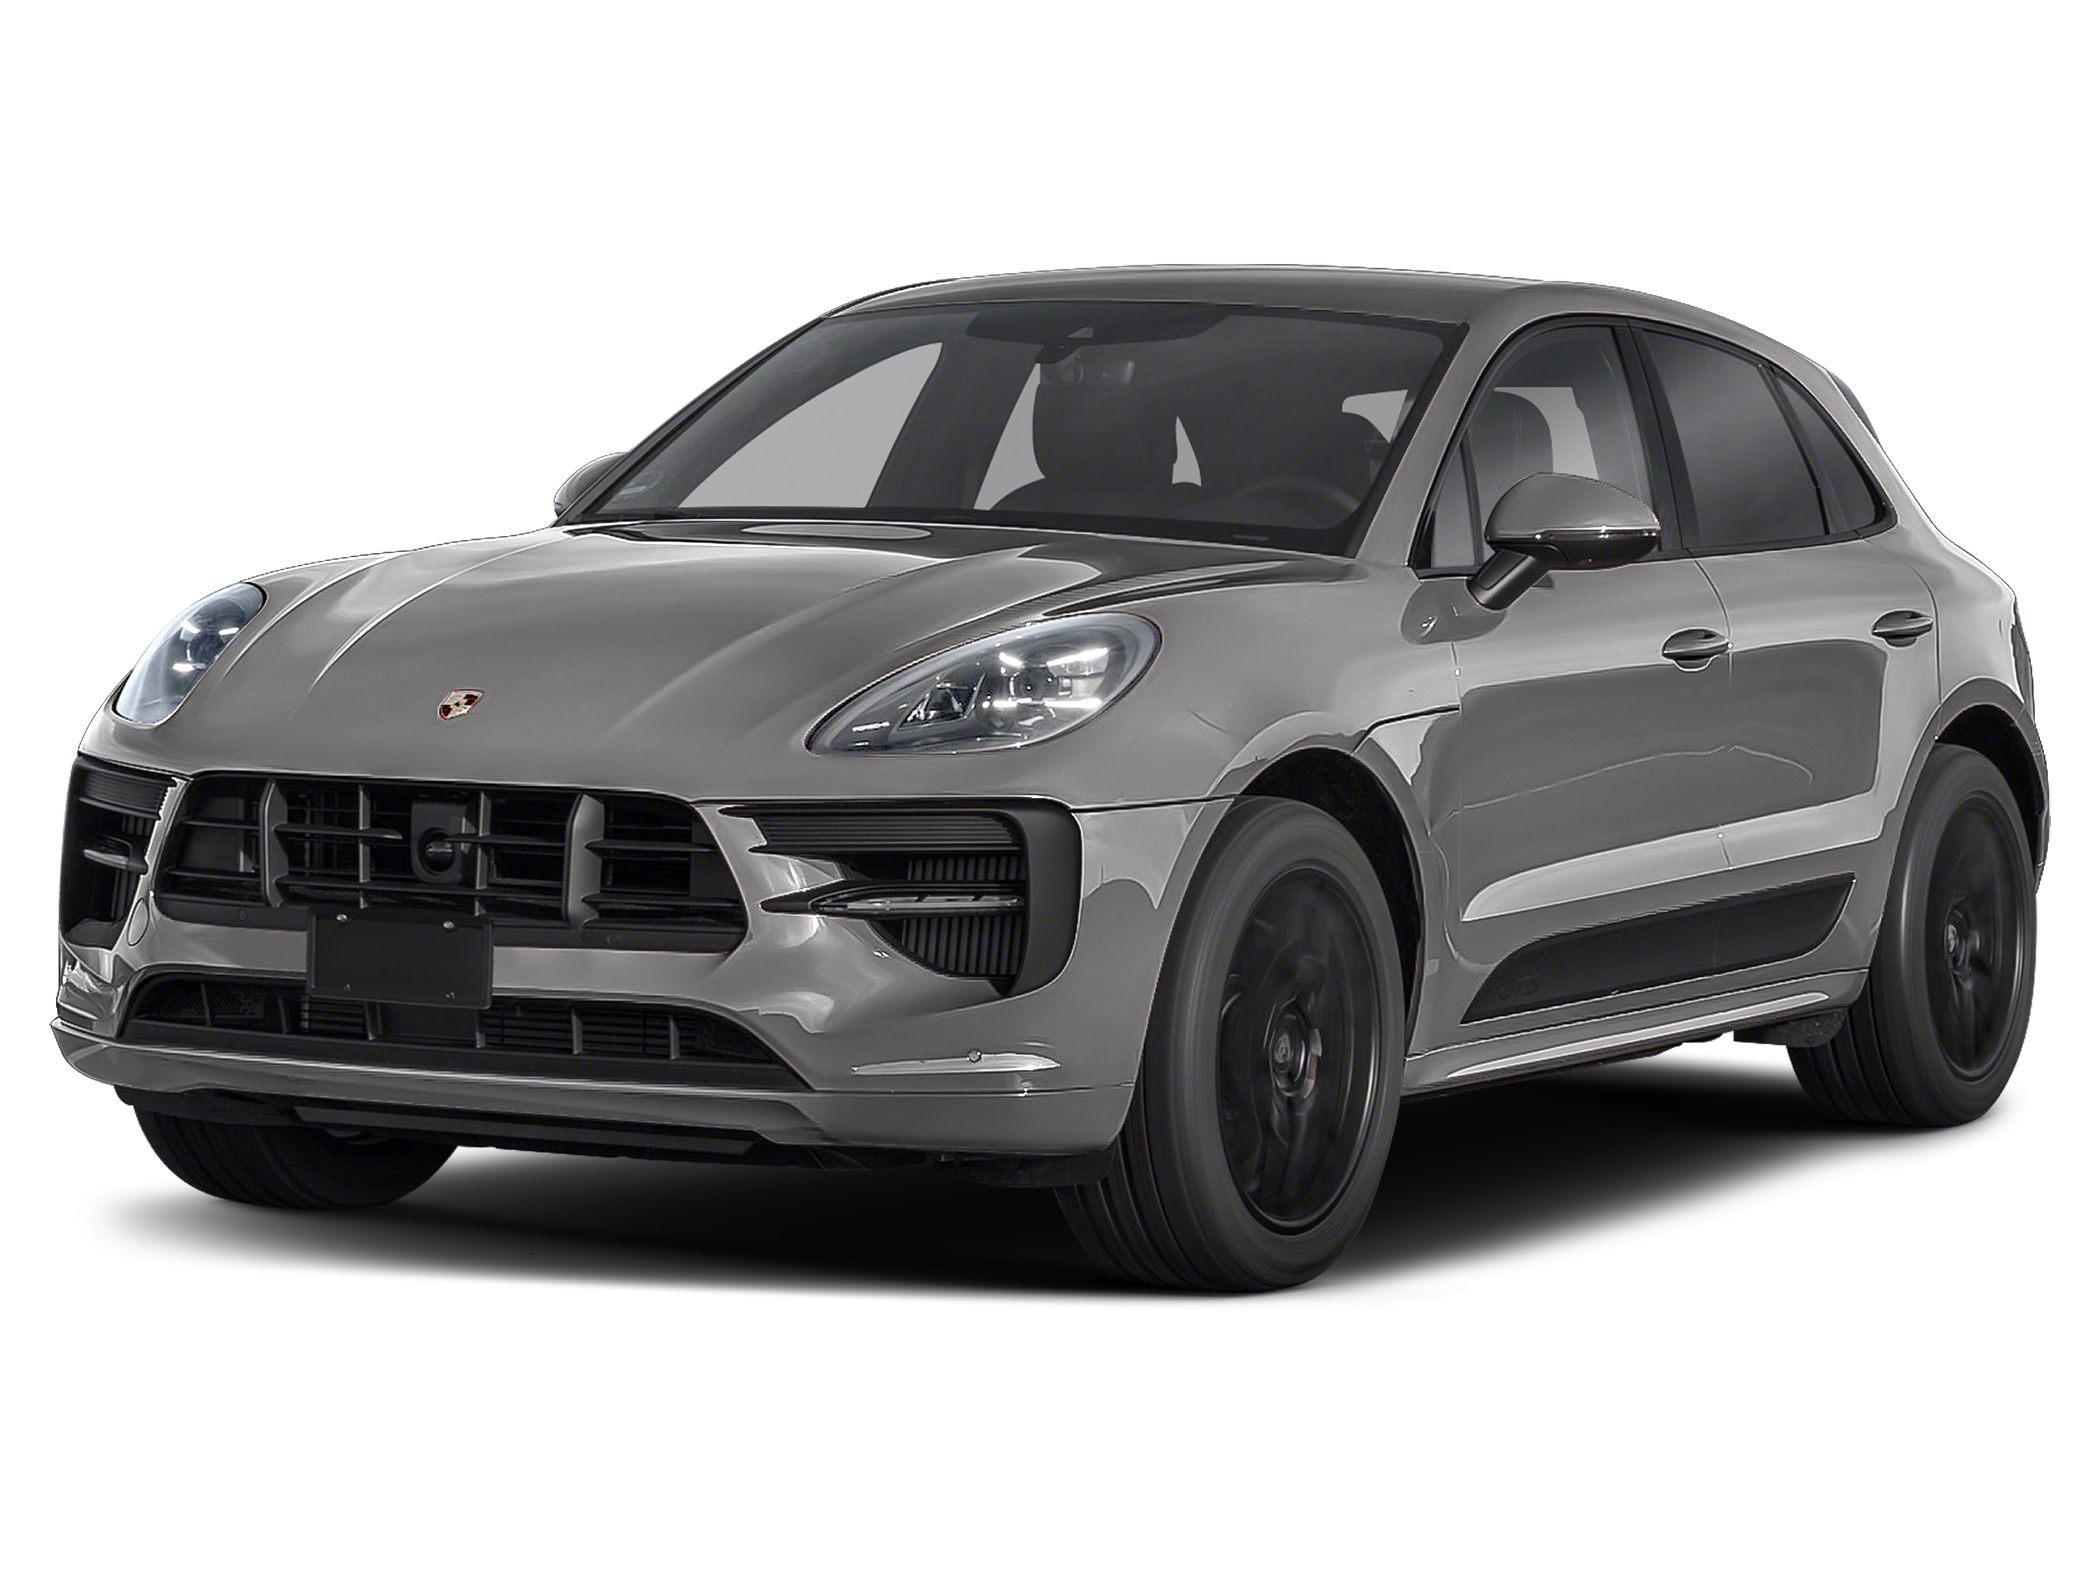 New 2021 Porsche Macan For Sale At Porsche Syracuse Vin Wp1ag2a54mlb51352